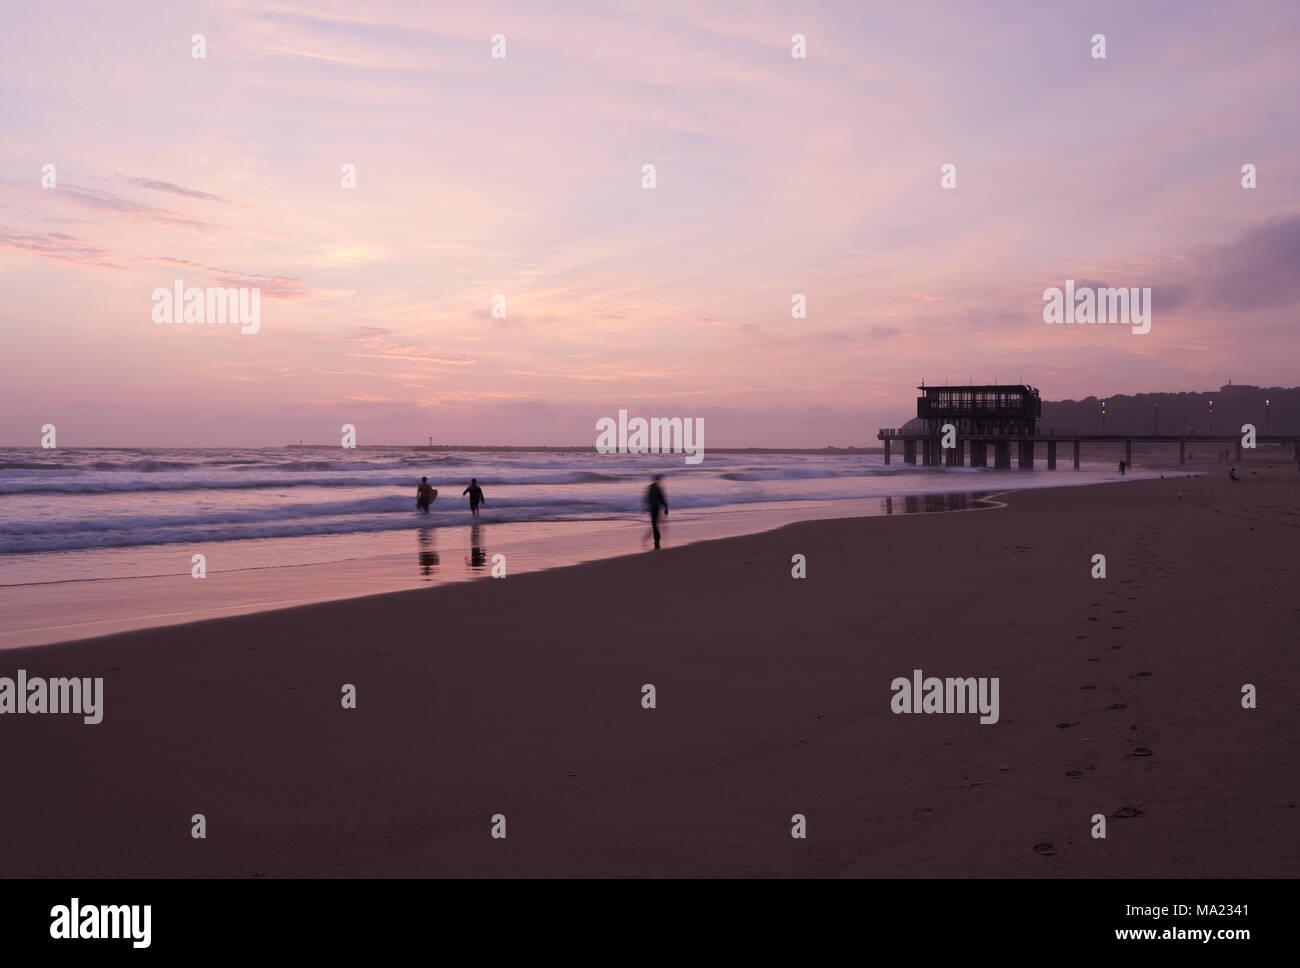 950502406 Durban, KwaZulu-Natal, South Africa, blur, people enjoying beach activities  at